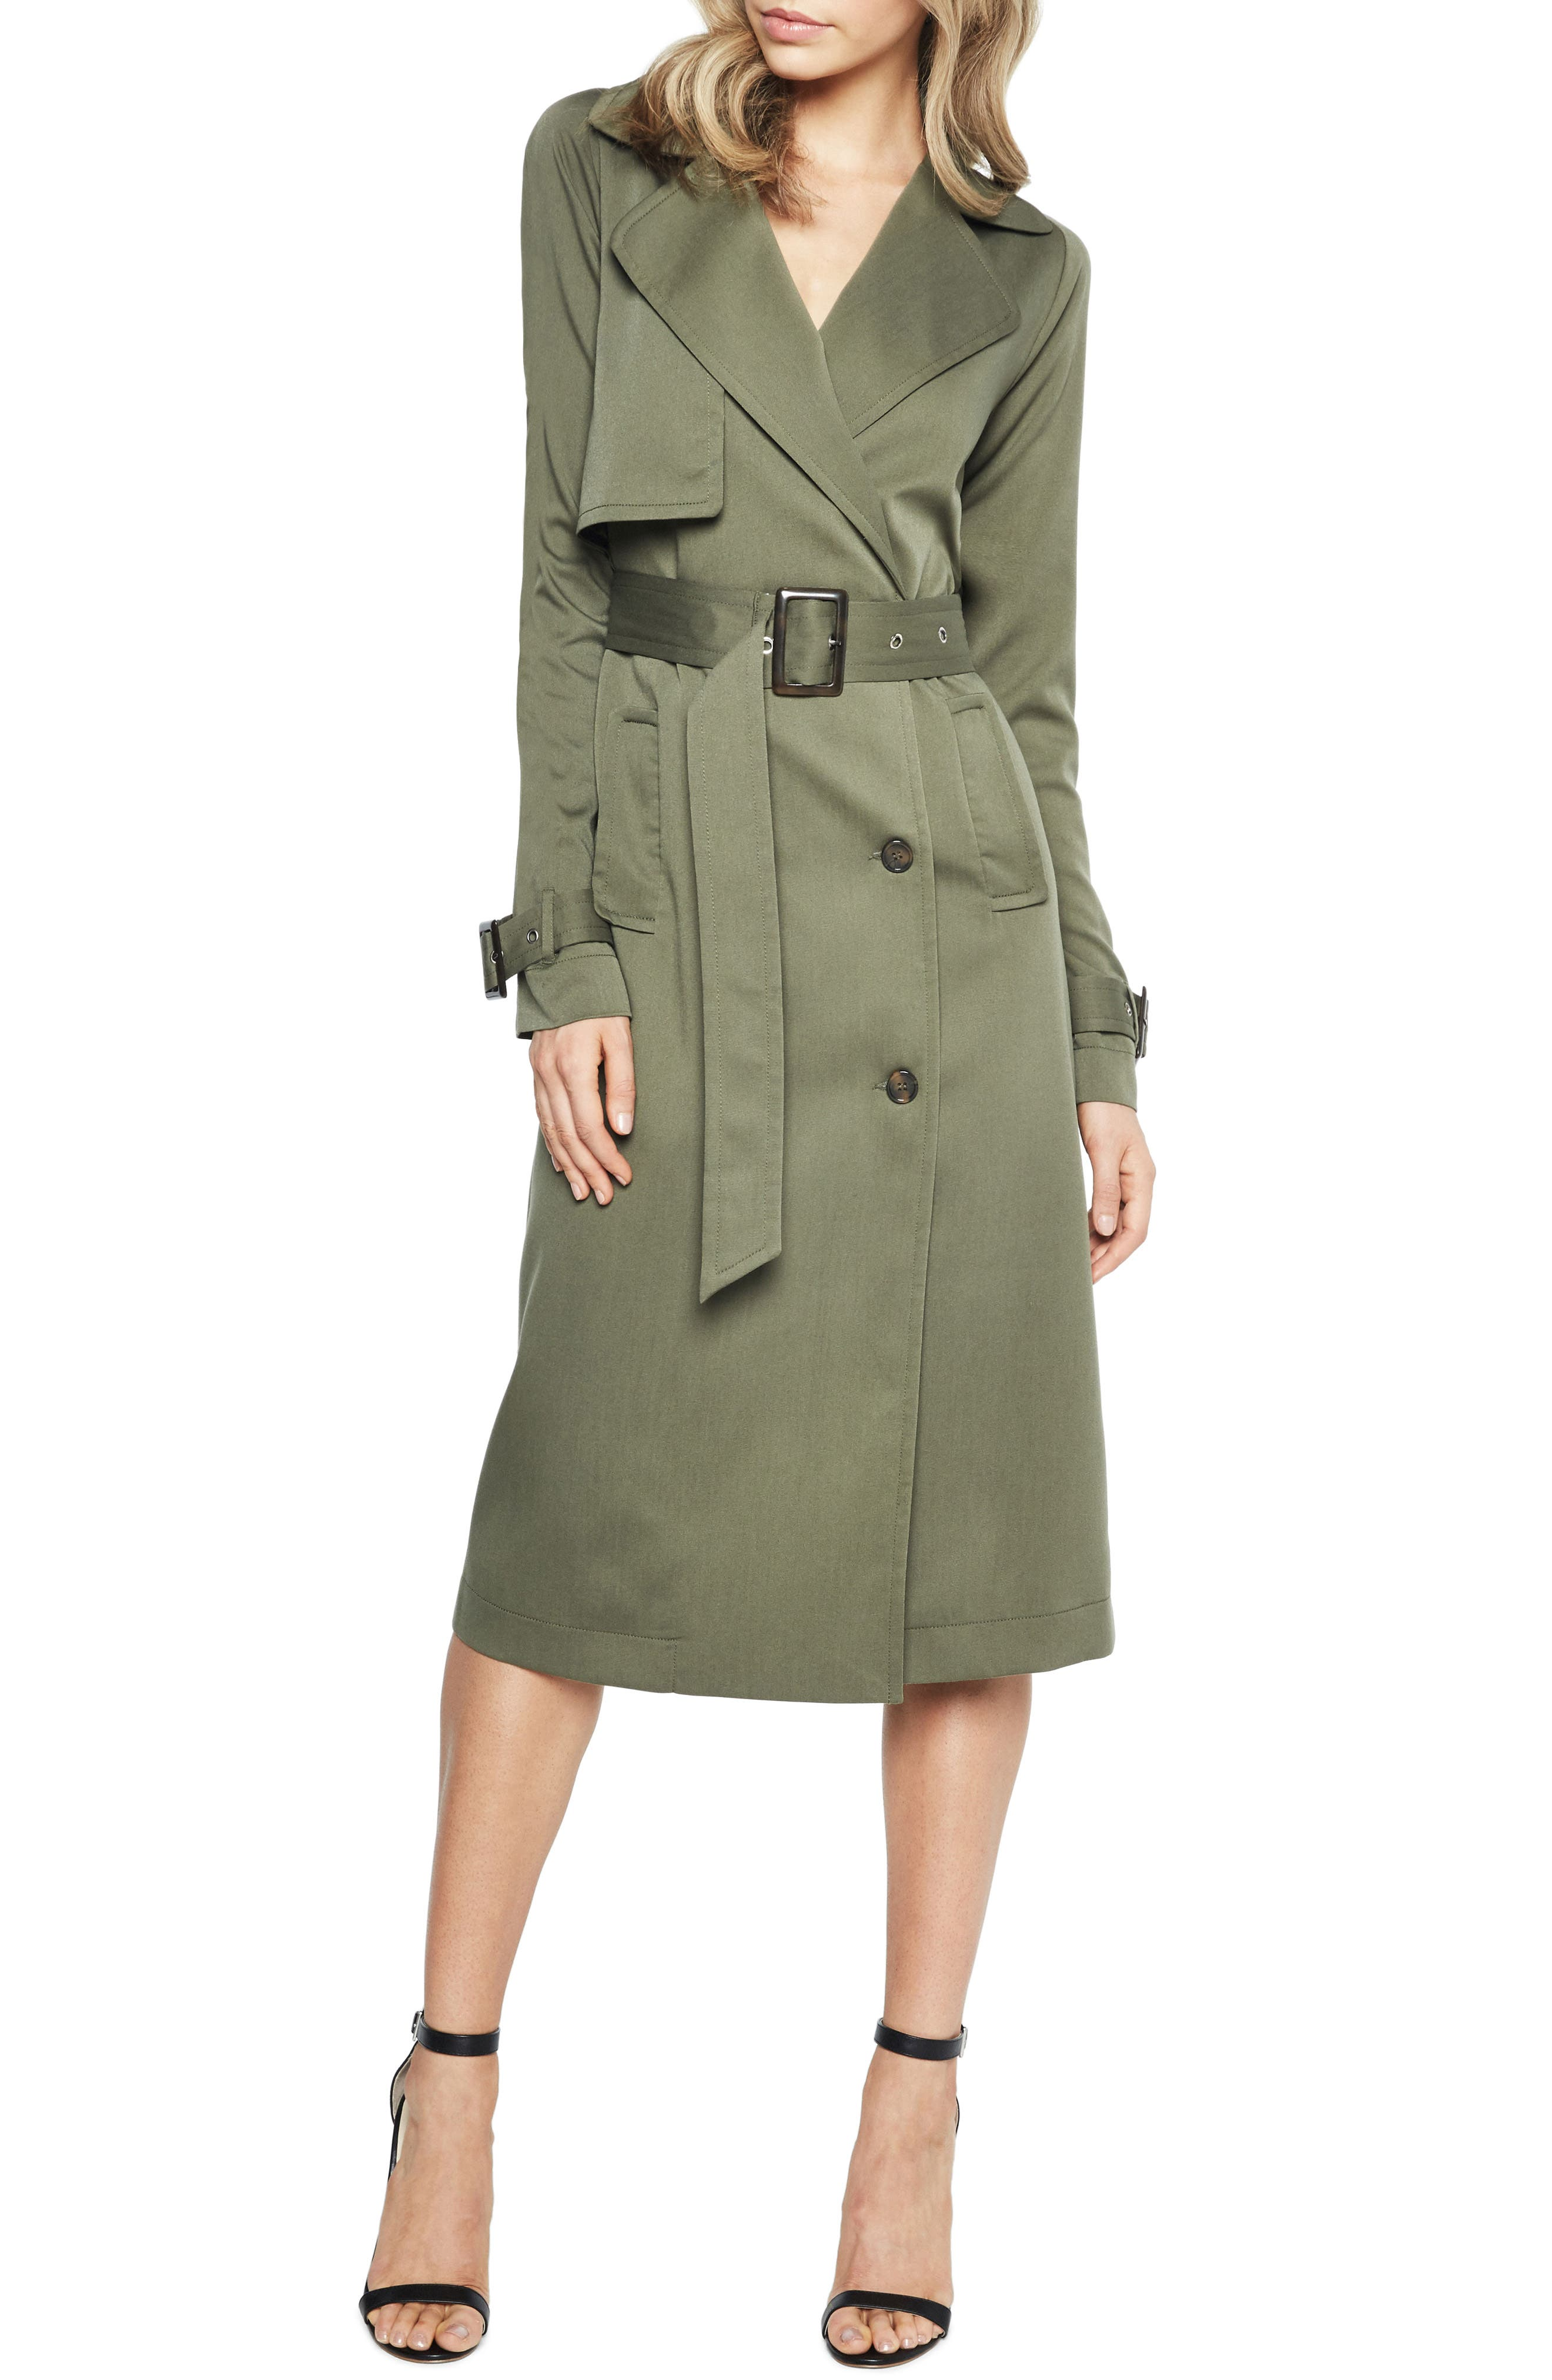 Alternate Image 1 Selected - Bardot Military Trench Dress